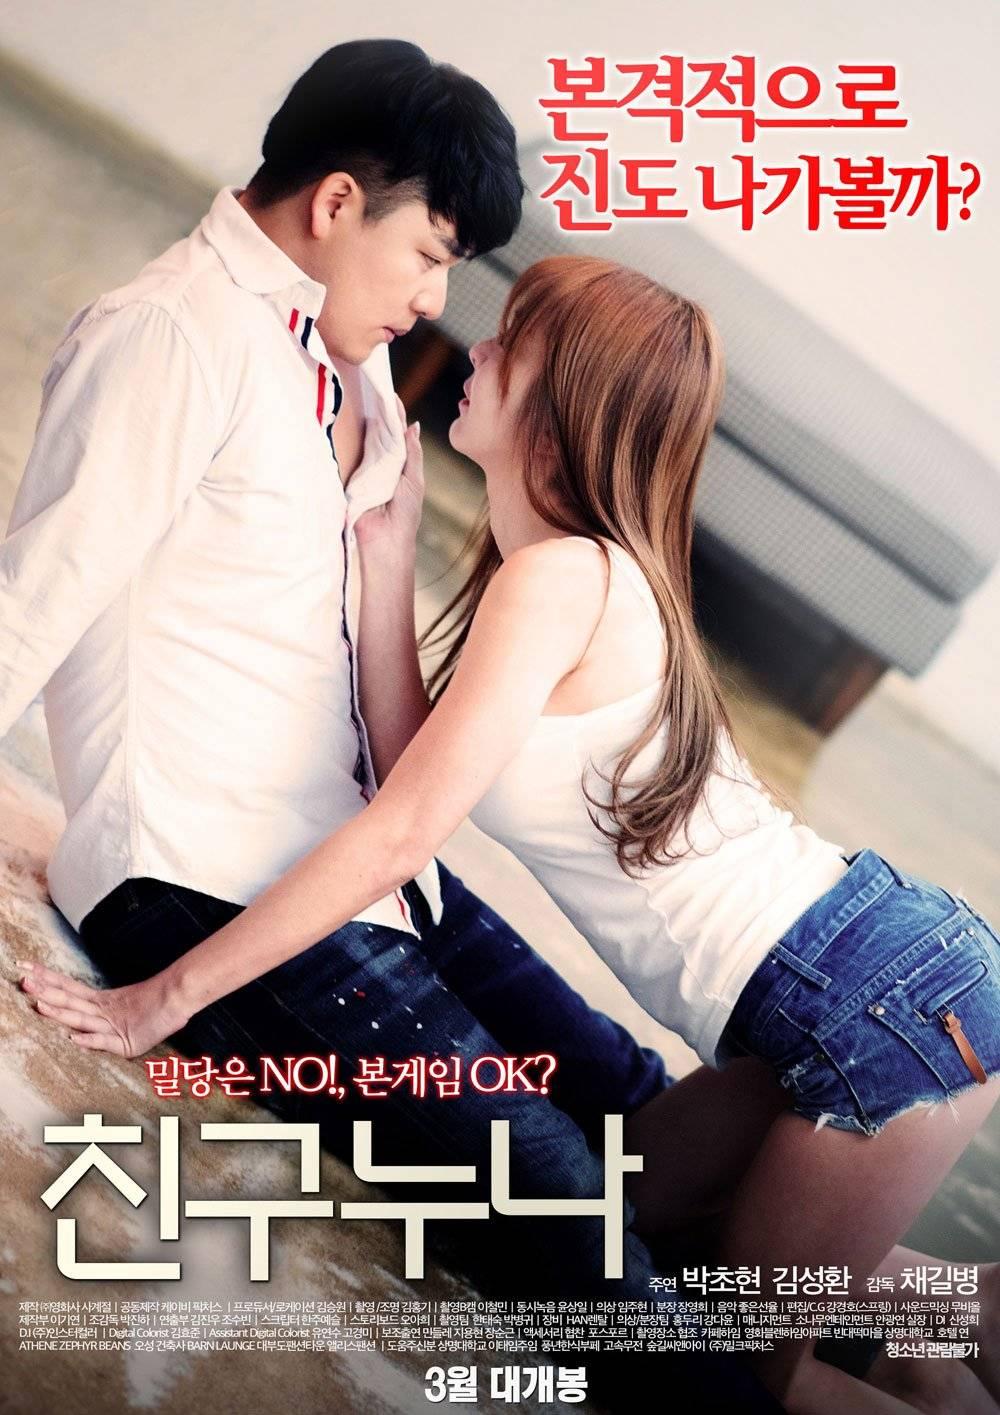 Korean Movies Opening Today 2016 03 10 In Korea Hancinema The